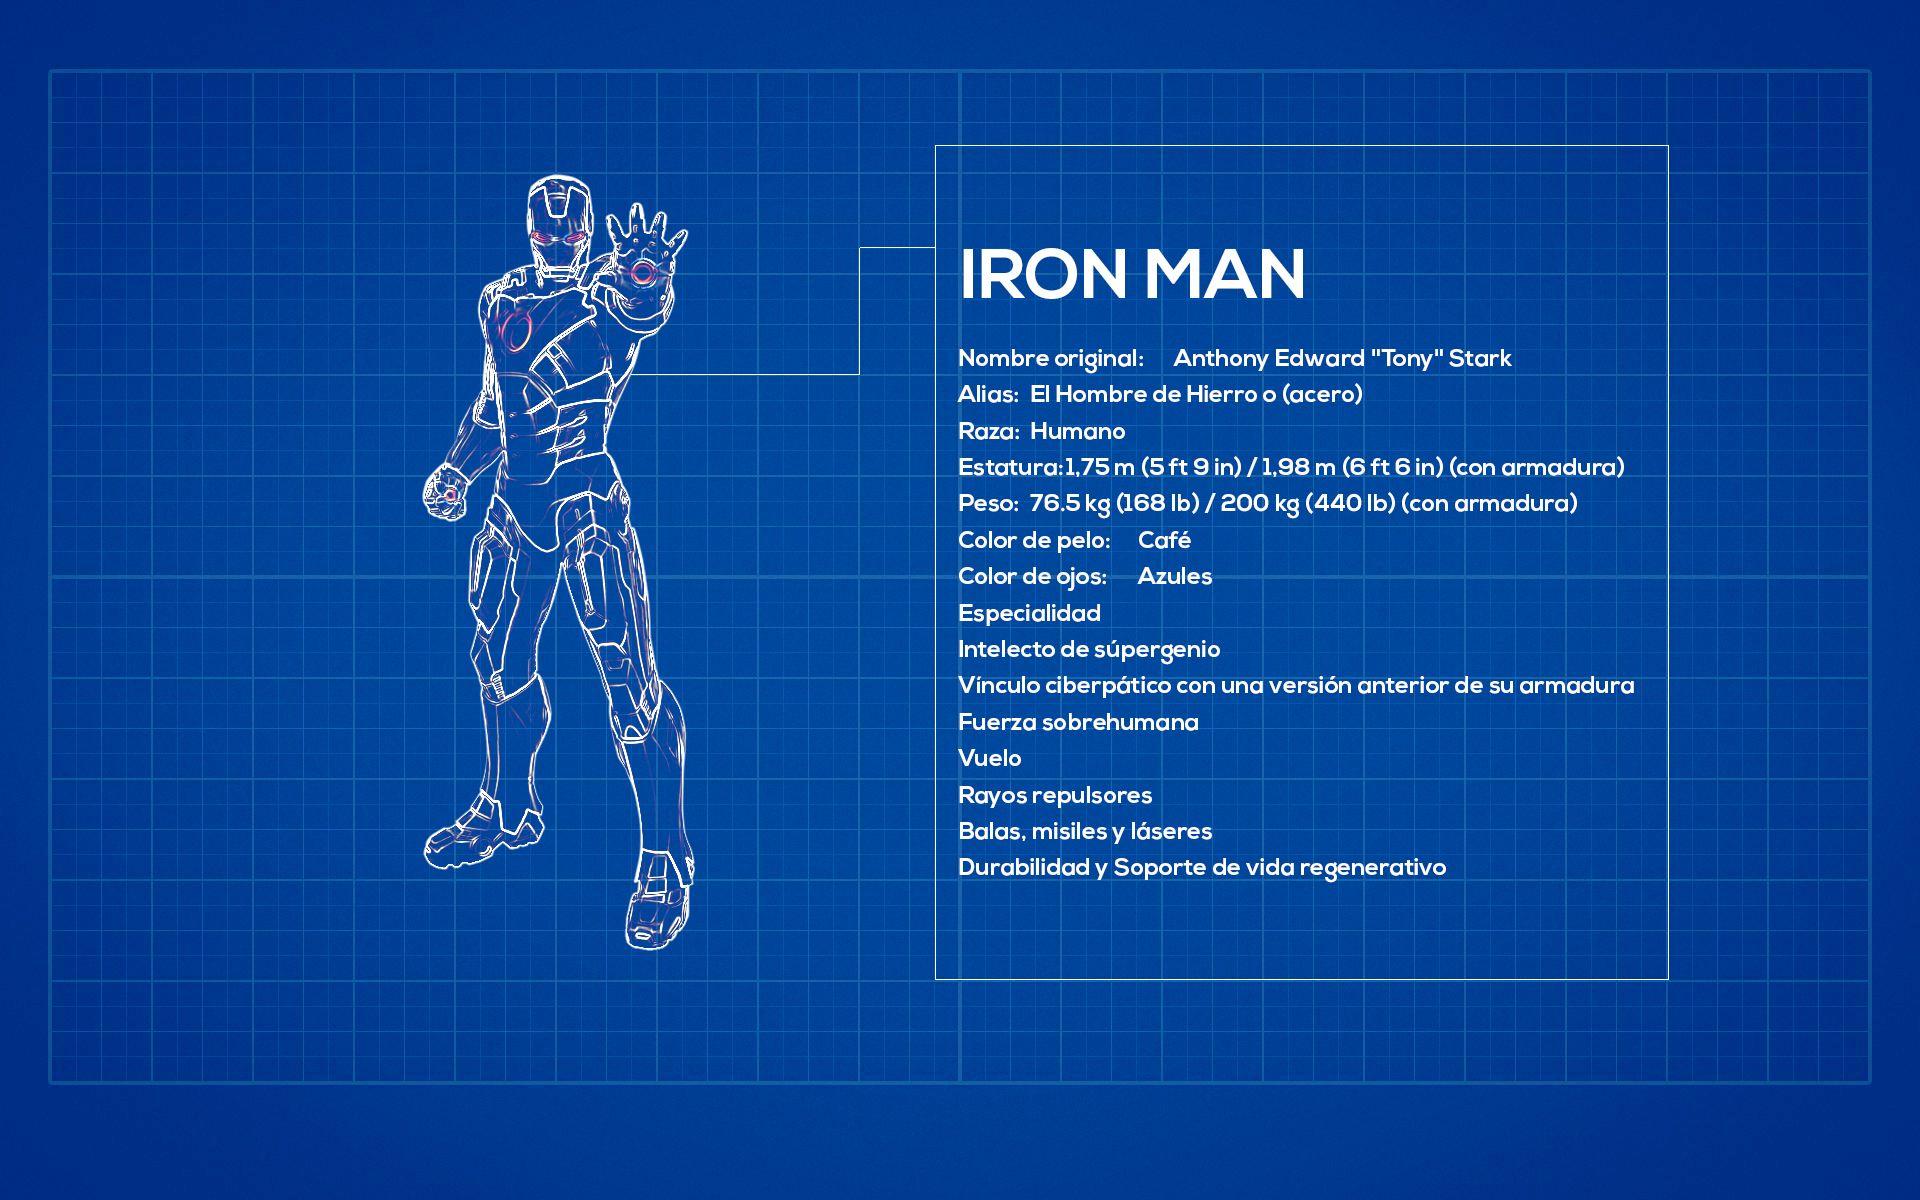 Blueprint iron man graphic design pinterest blueprint iron man iron manironsgraphic designirongraphics malvernweather Image collections